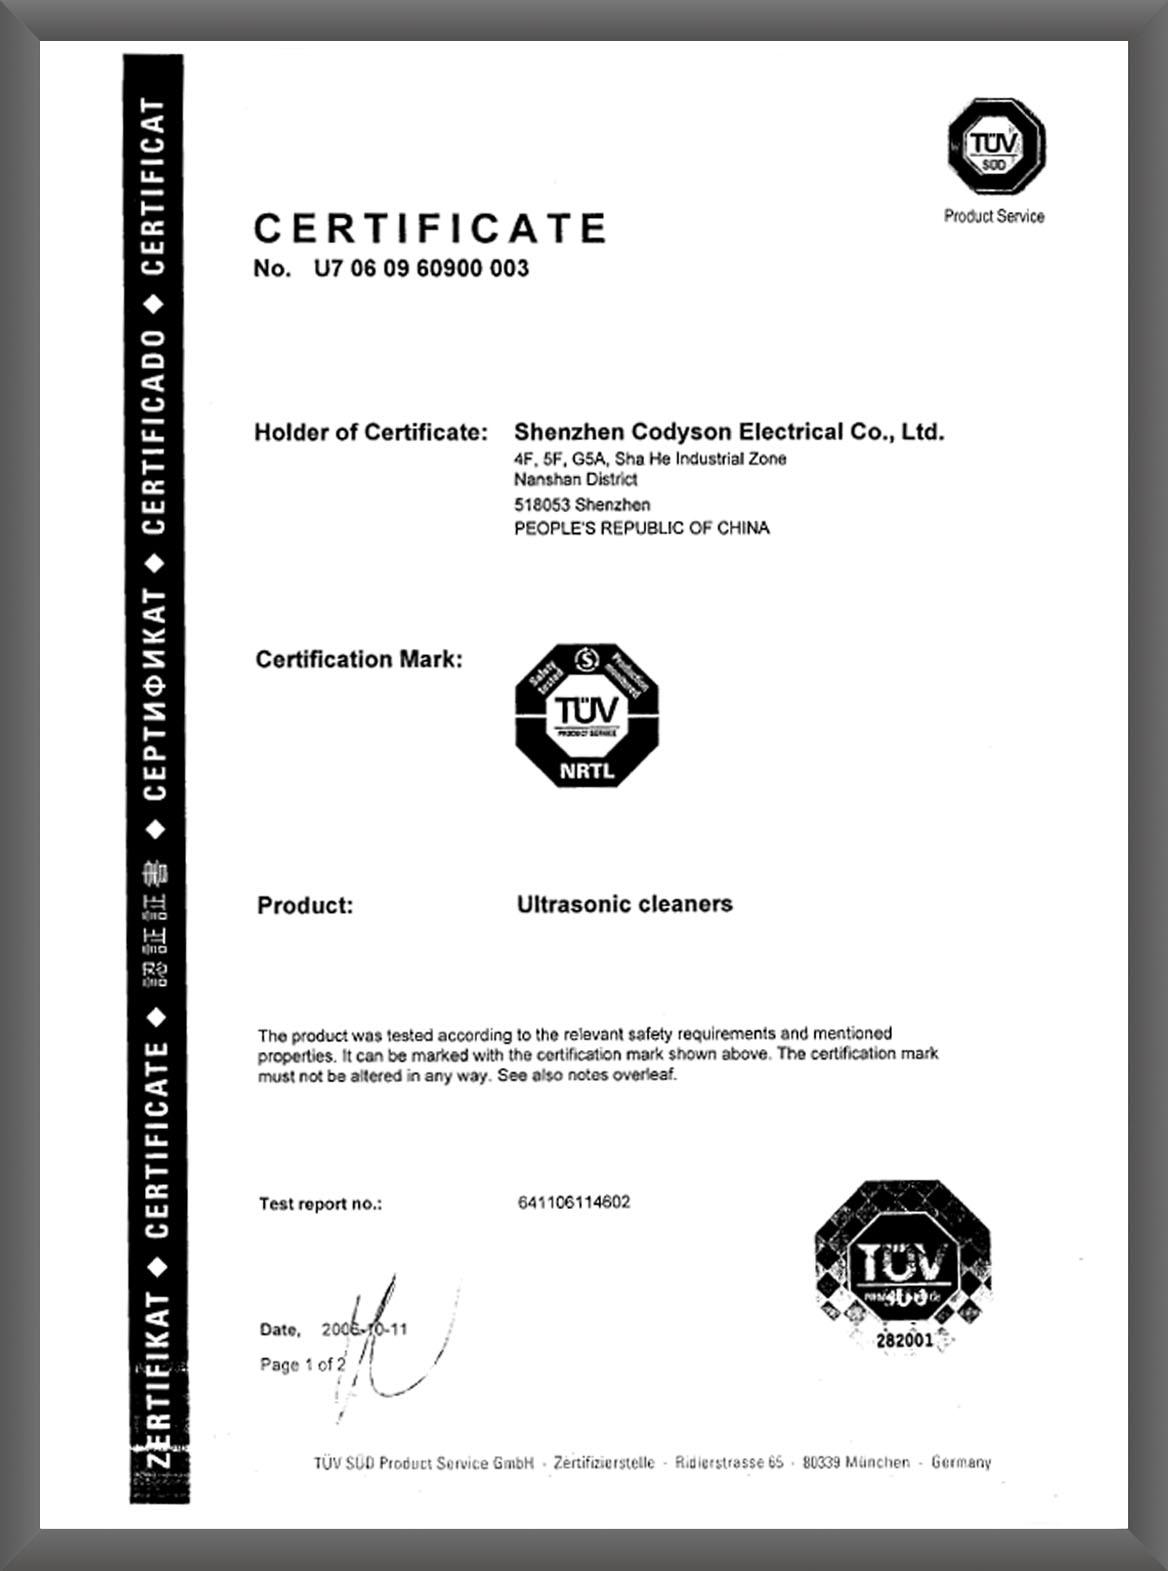 TUV Patent certificate